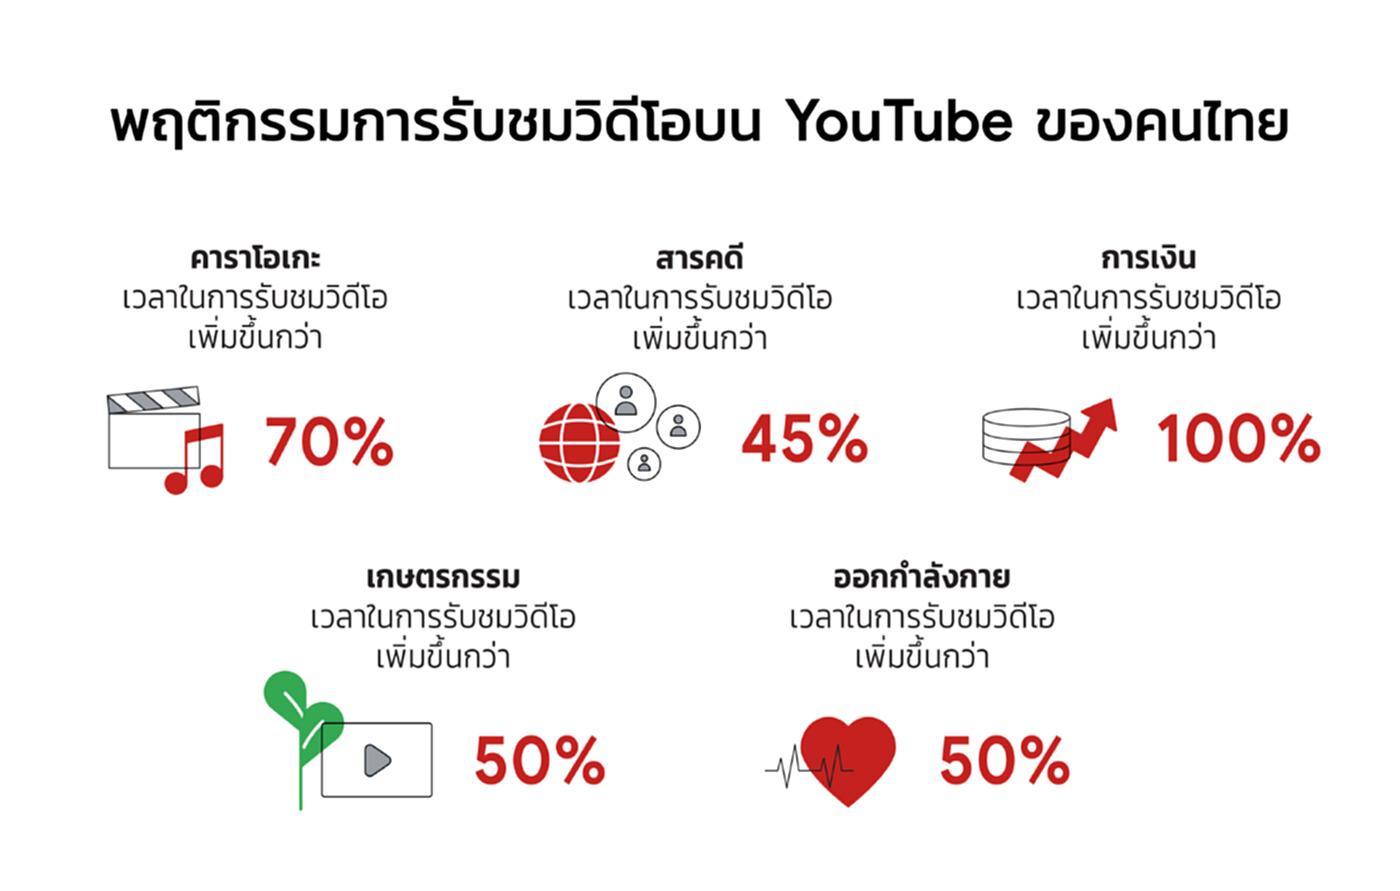 YouTube เผยจำนวนชั่วโมงคอนเทนท์ที่อัปโหลดในไทยพุ่ง 80%